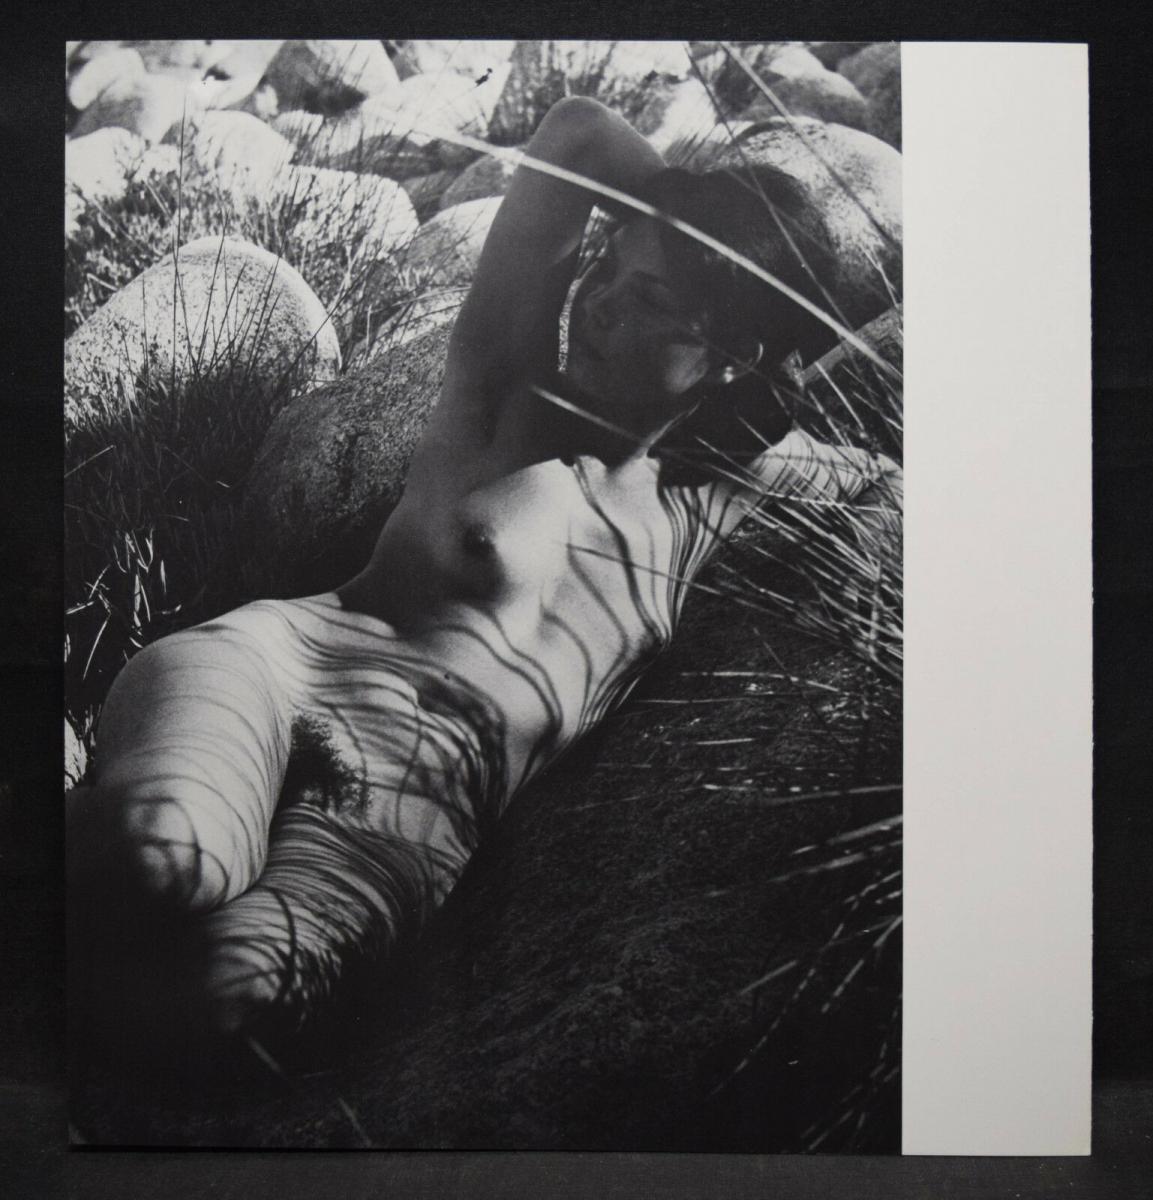 ANDRÉ KRETZ - CANTATE A NAUSICAA - WIDMUNG - ORIGINALZEICHNUNG - 1980 - FOTOS 8